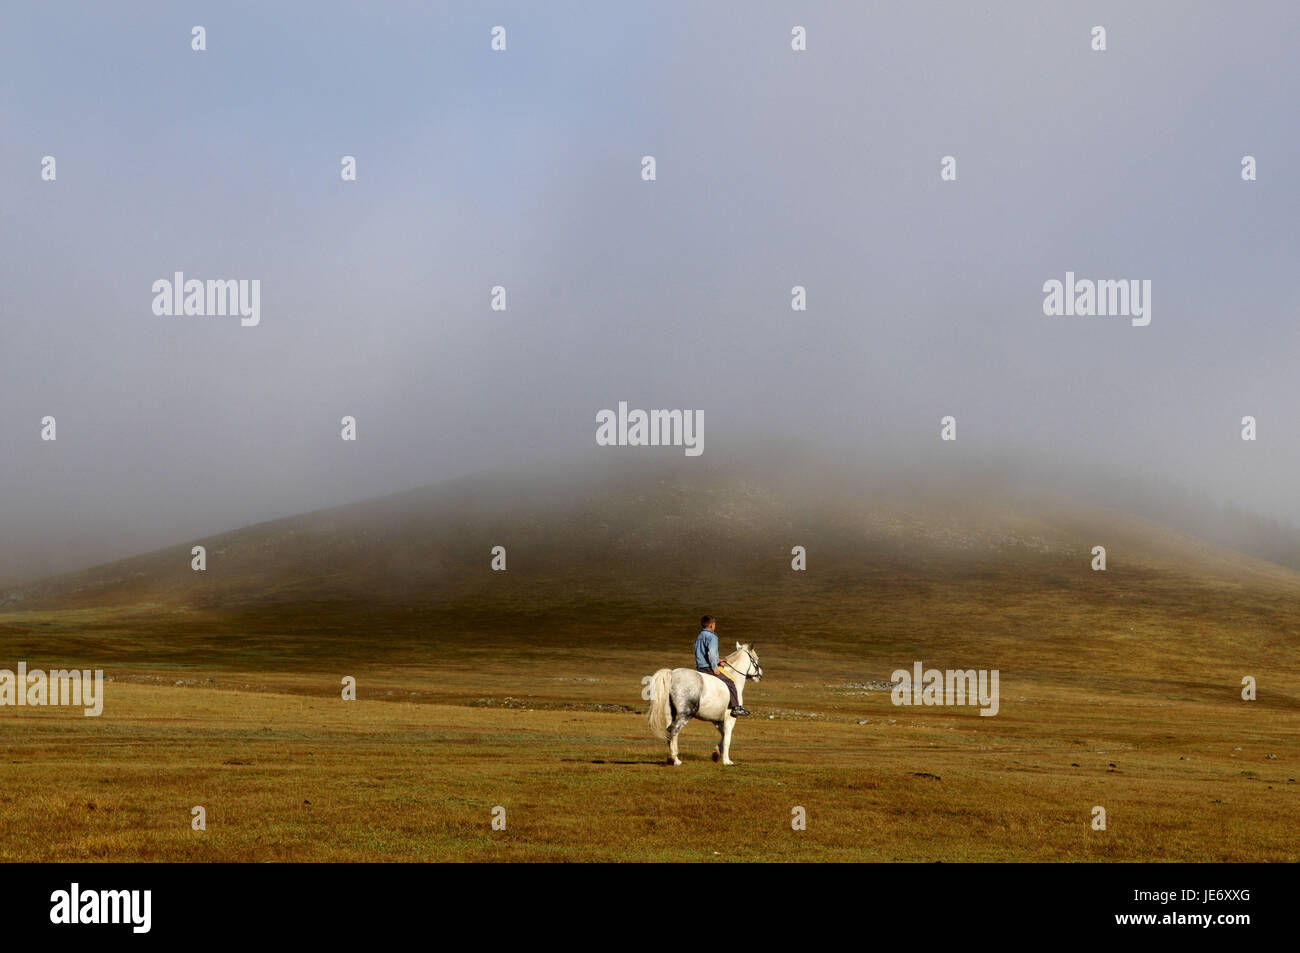 Mongolia, Central Asia, Arkhangai province, boy on white horse, scenery, fog, - Stock Image